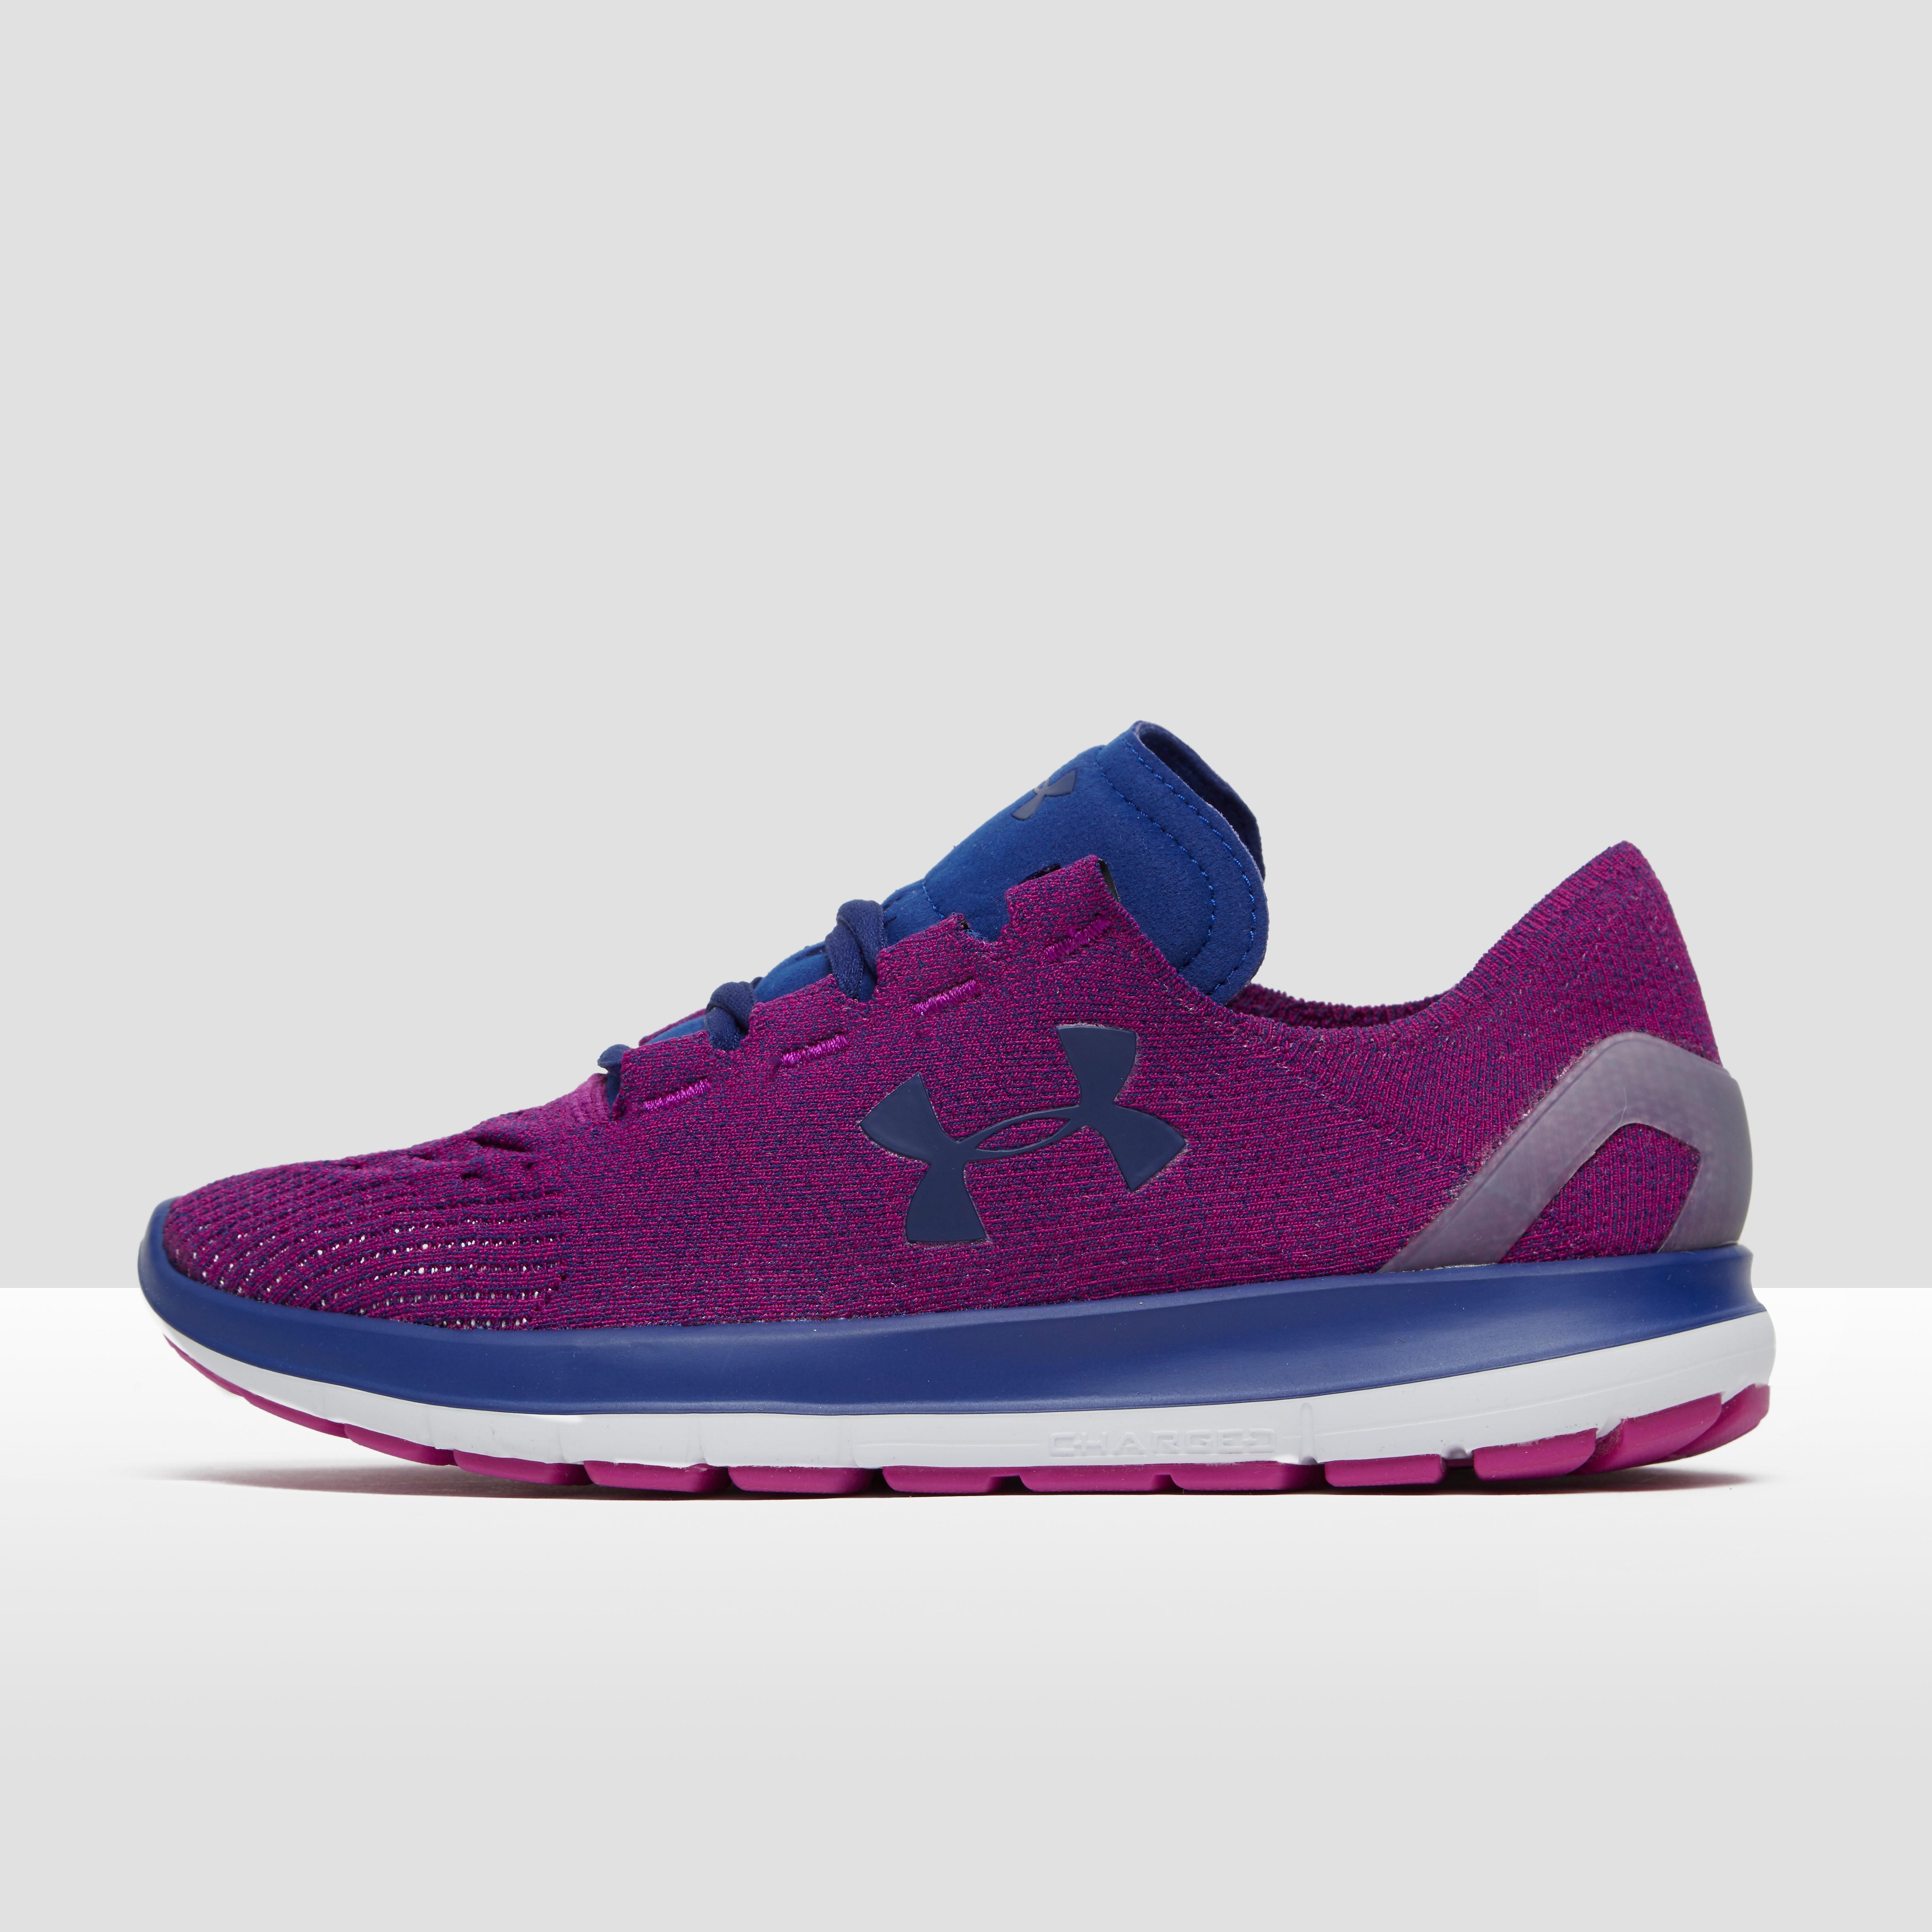 Under Armour Women's SpeedForm Slingride Running Shoes